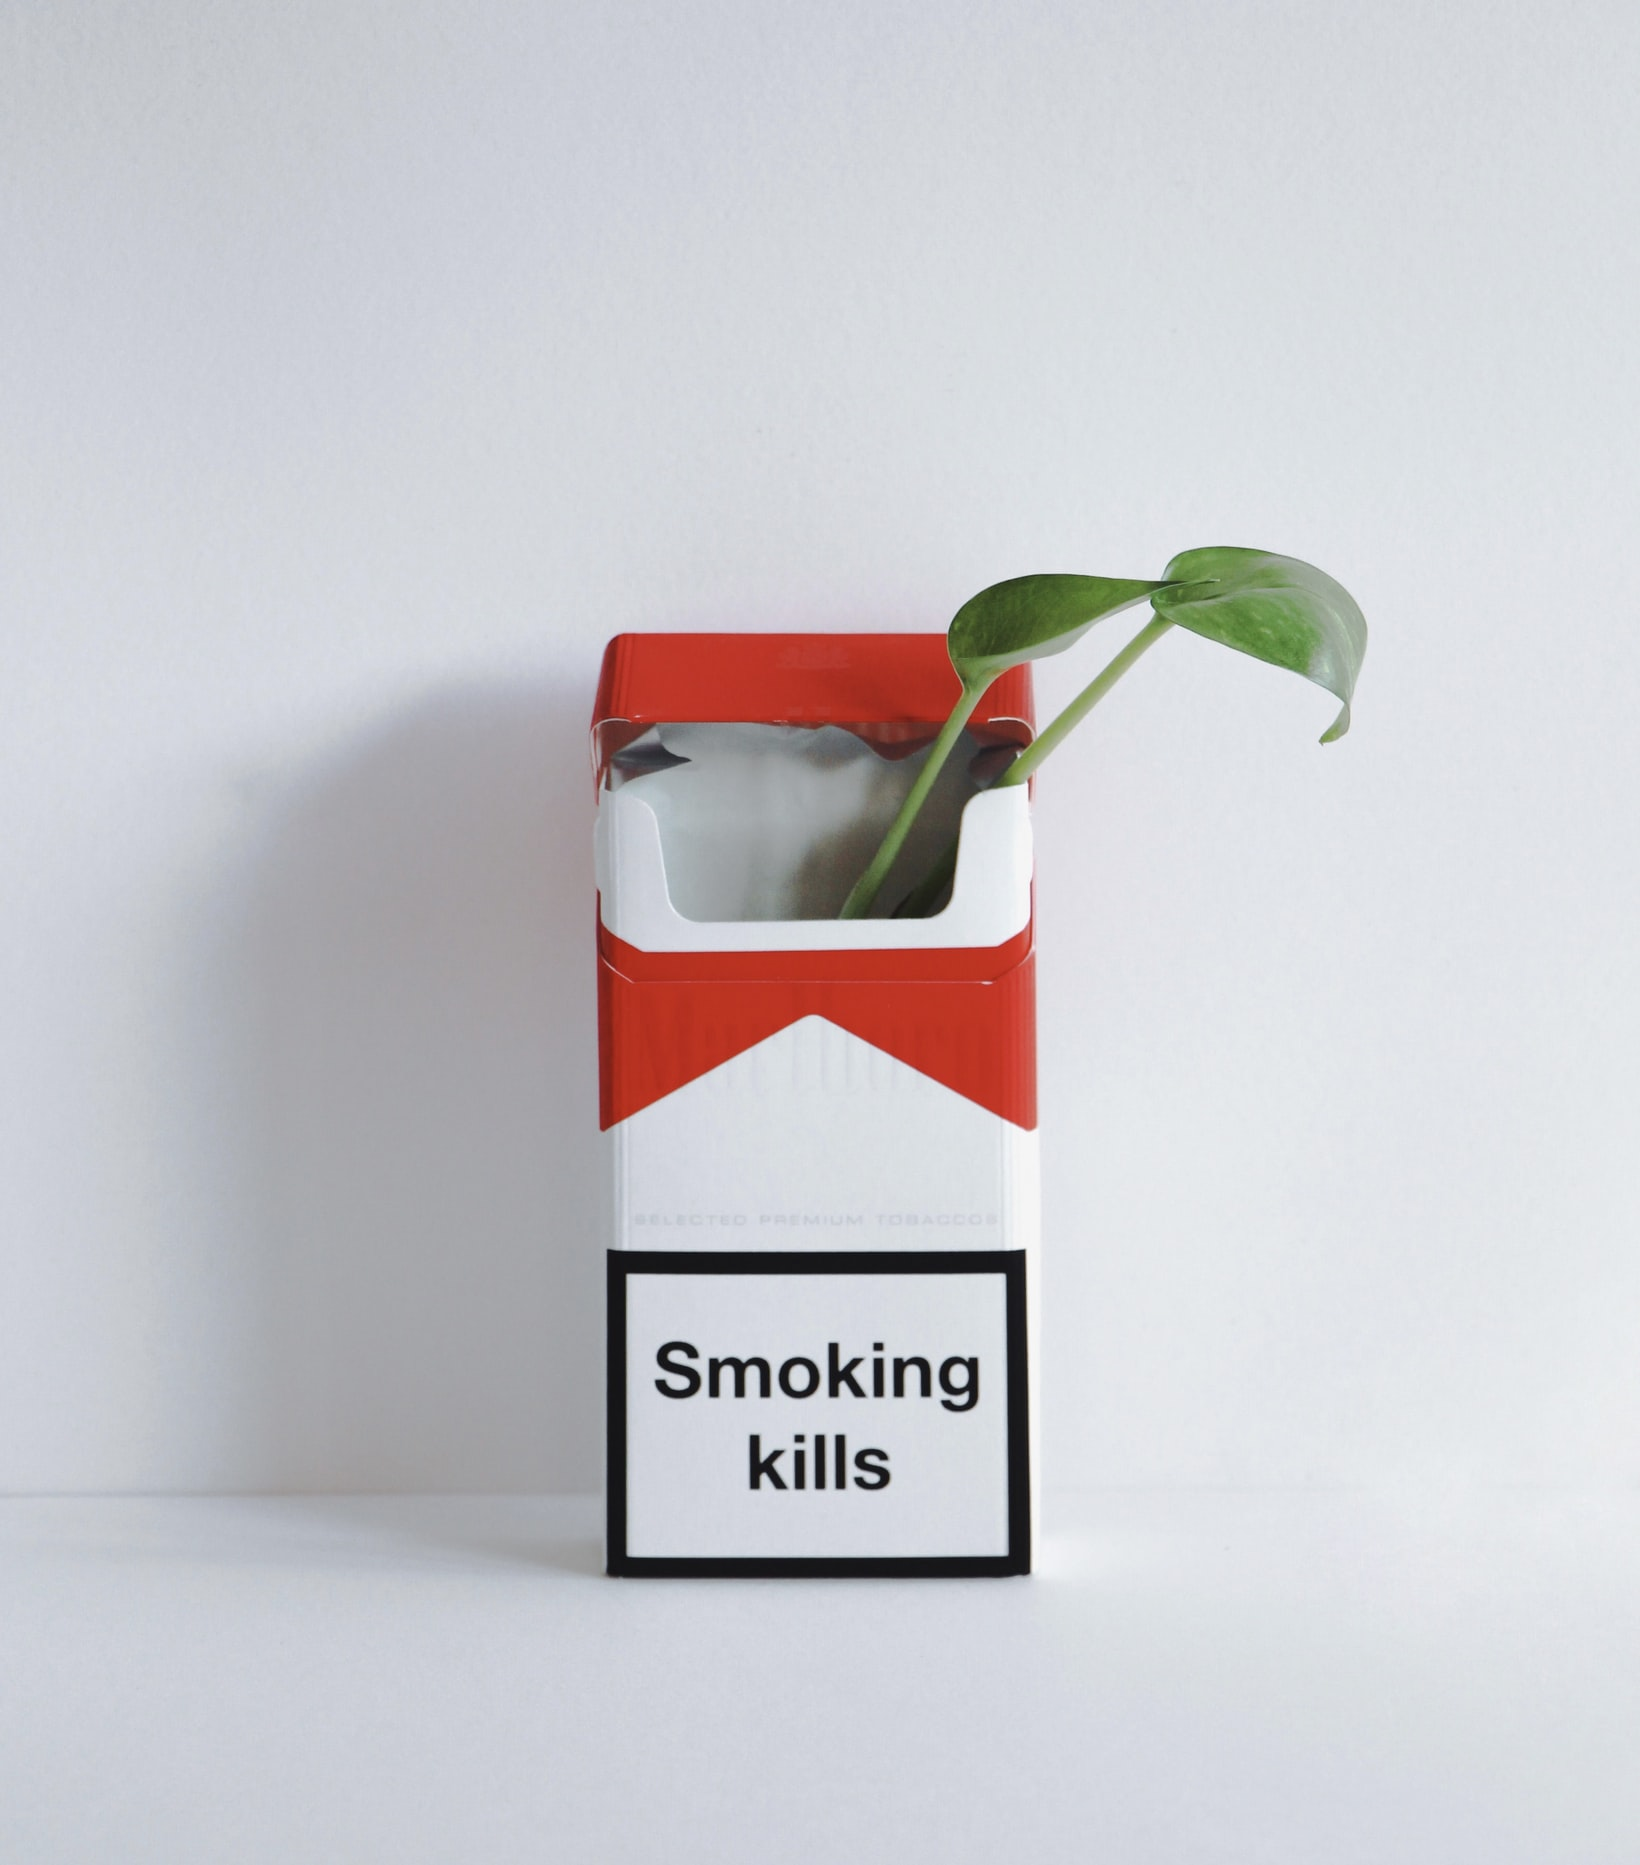 Smoking kills, plante, cigaretpakke